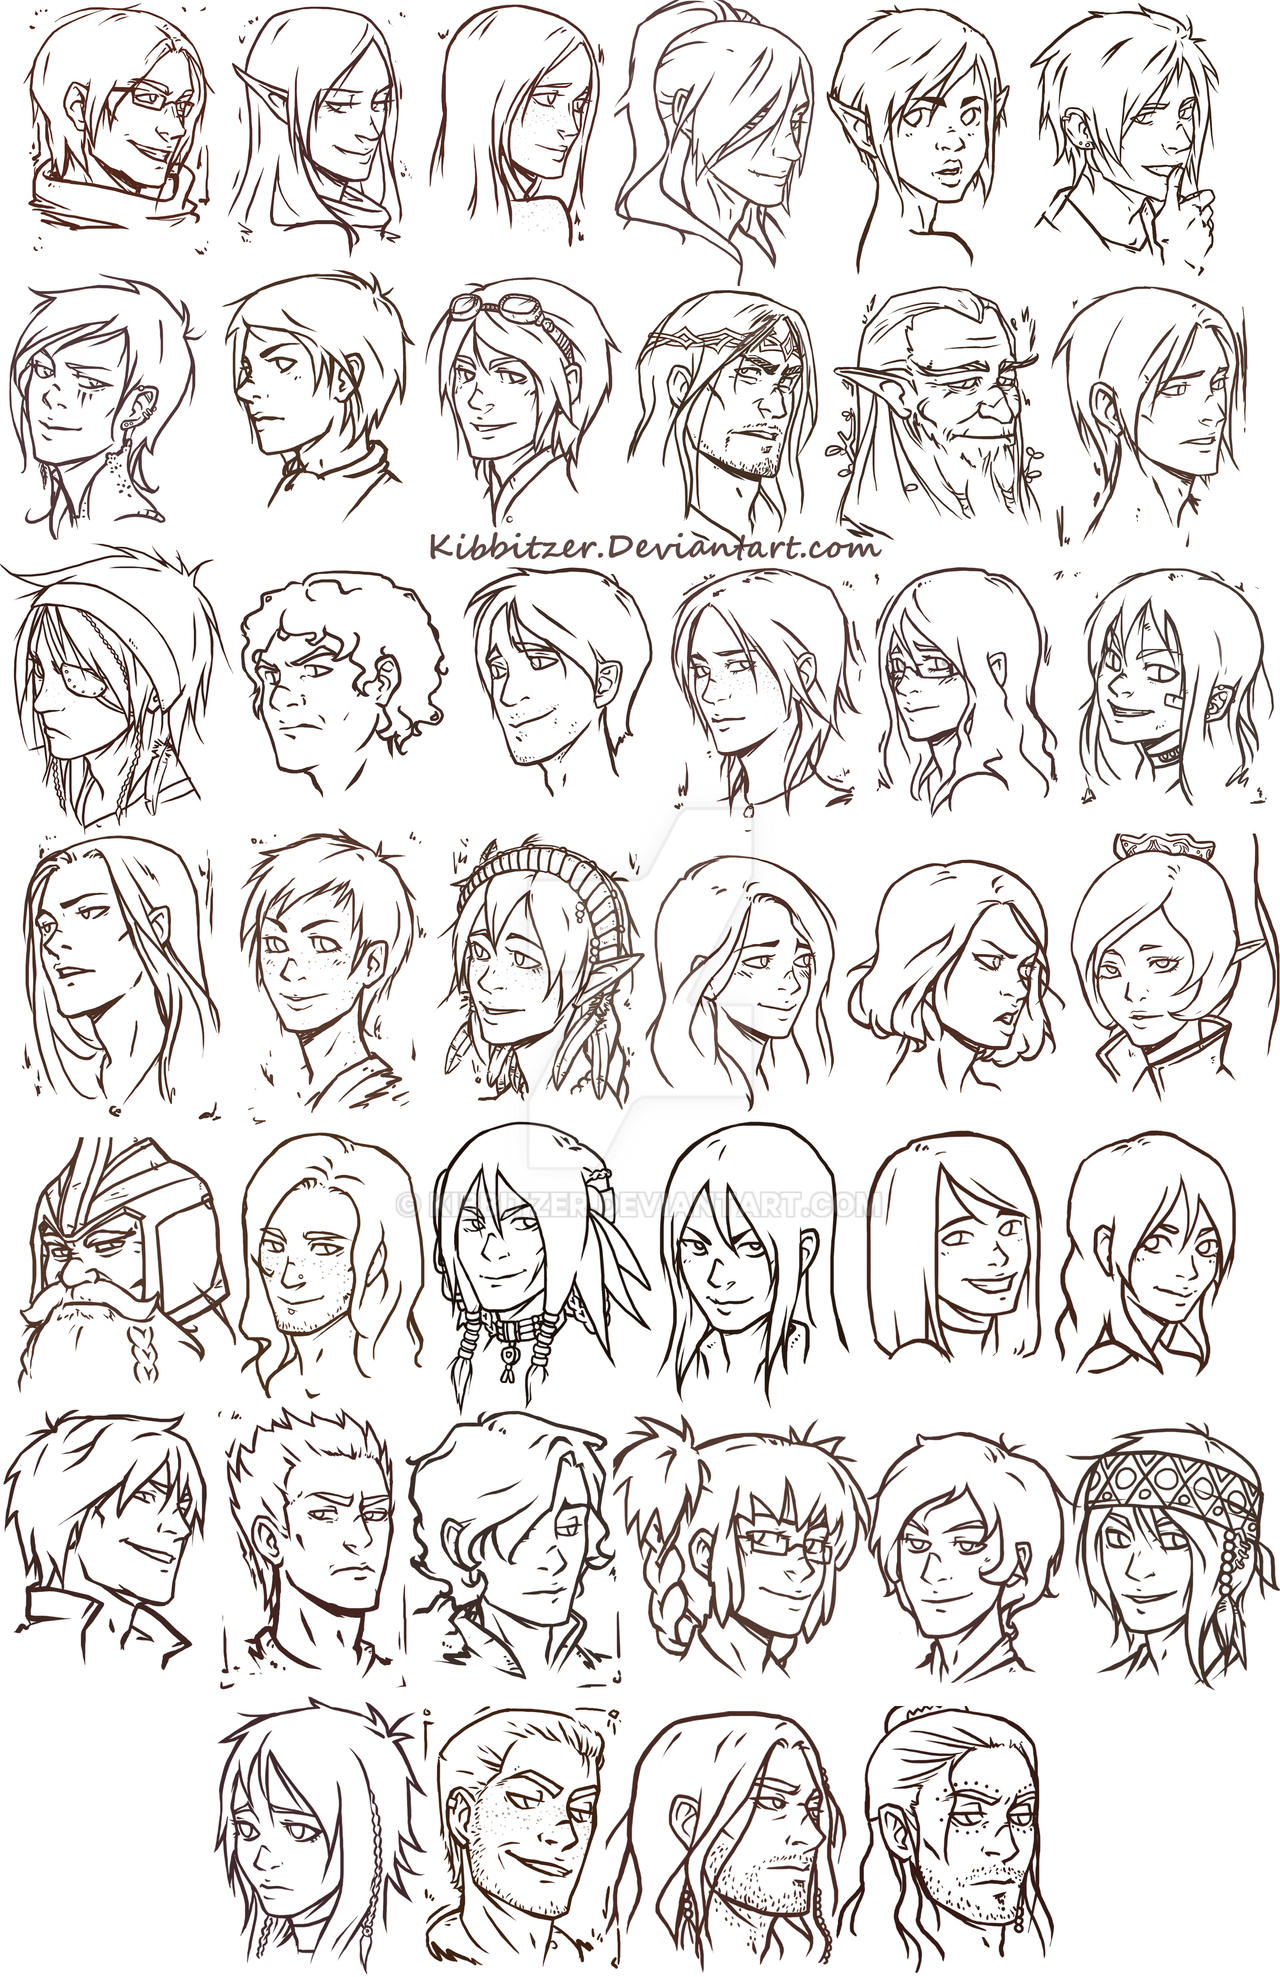 40 heads by Kibbitzer